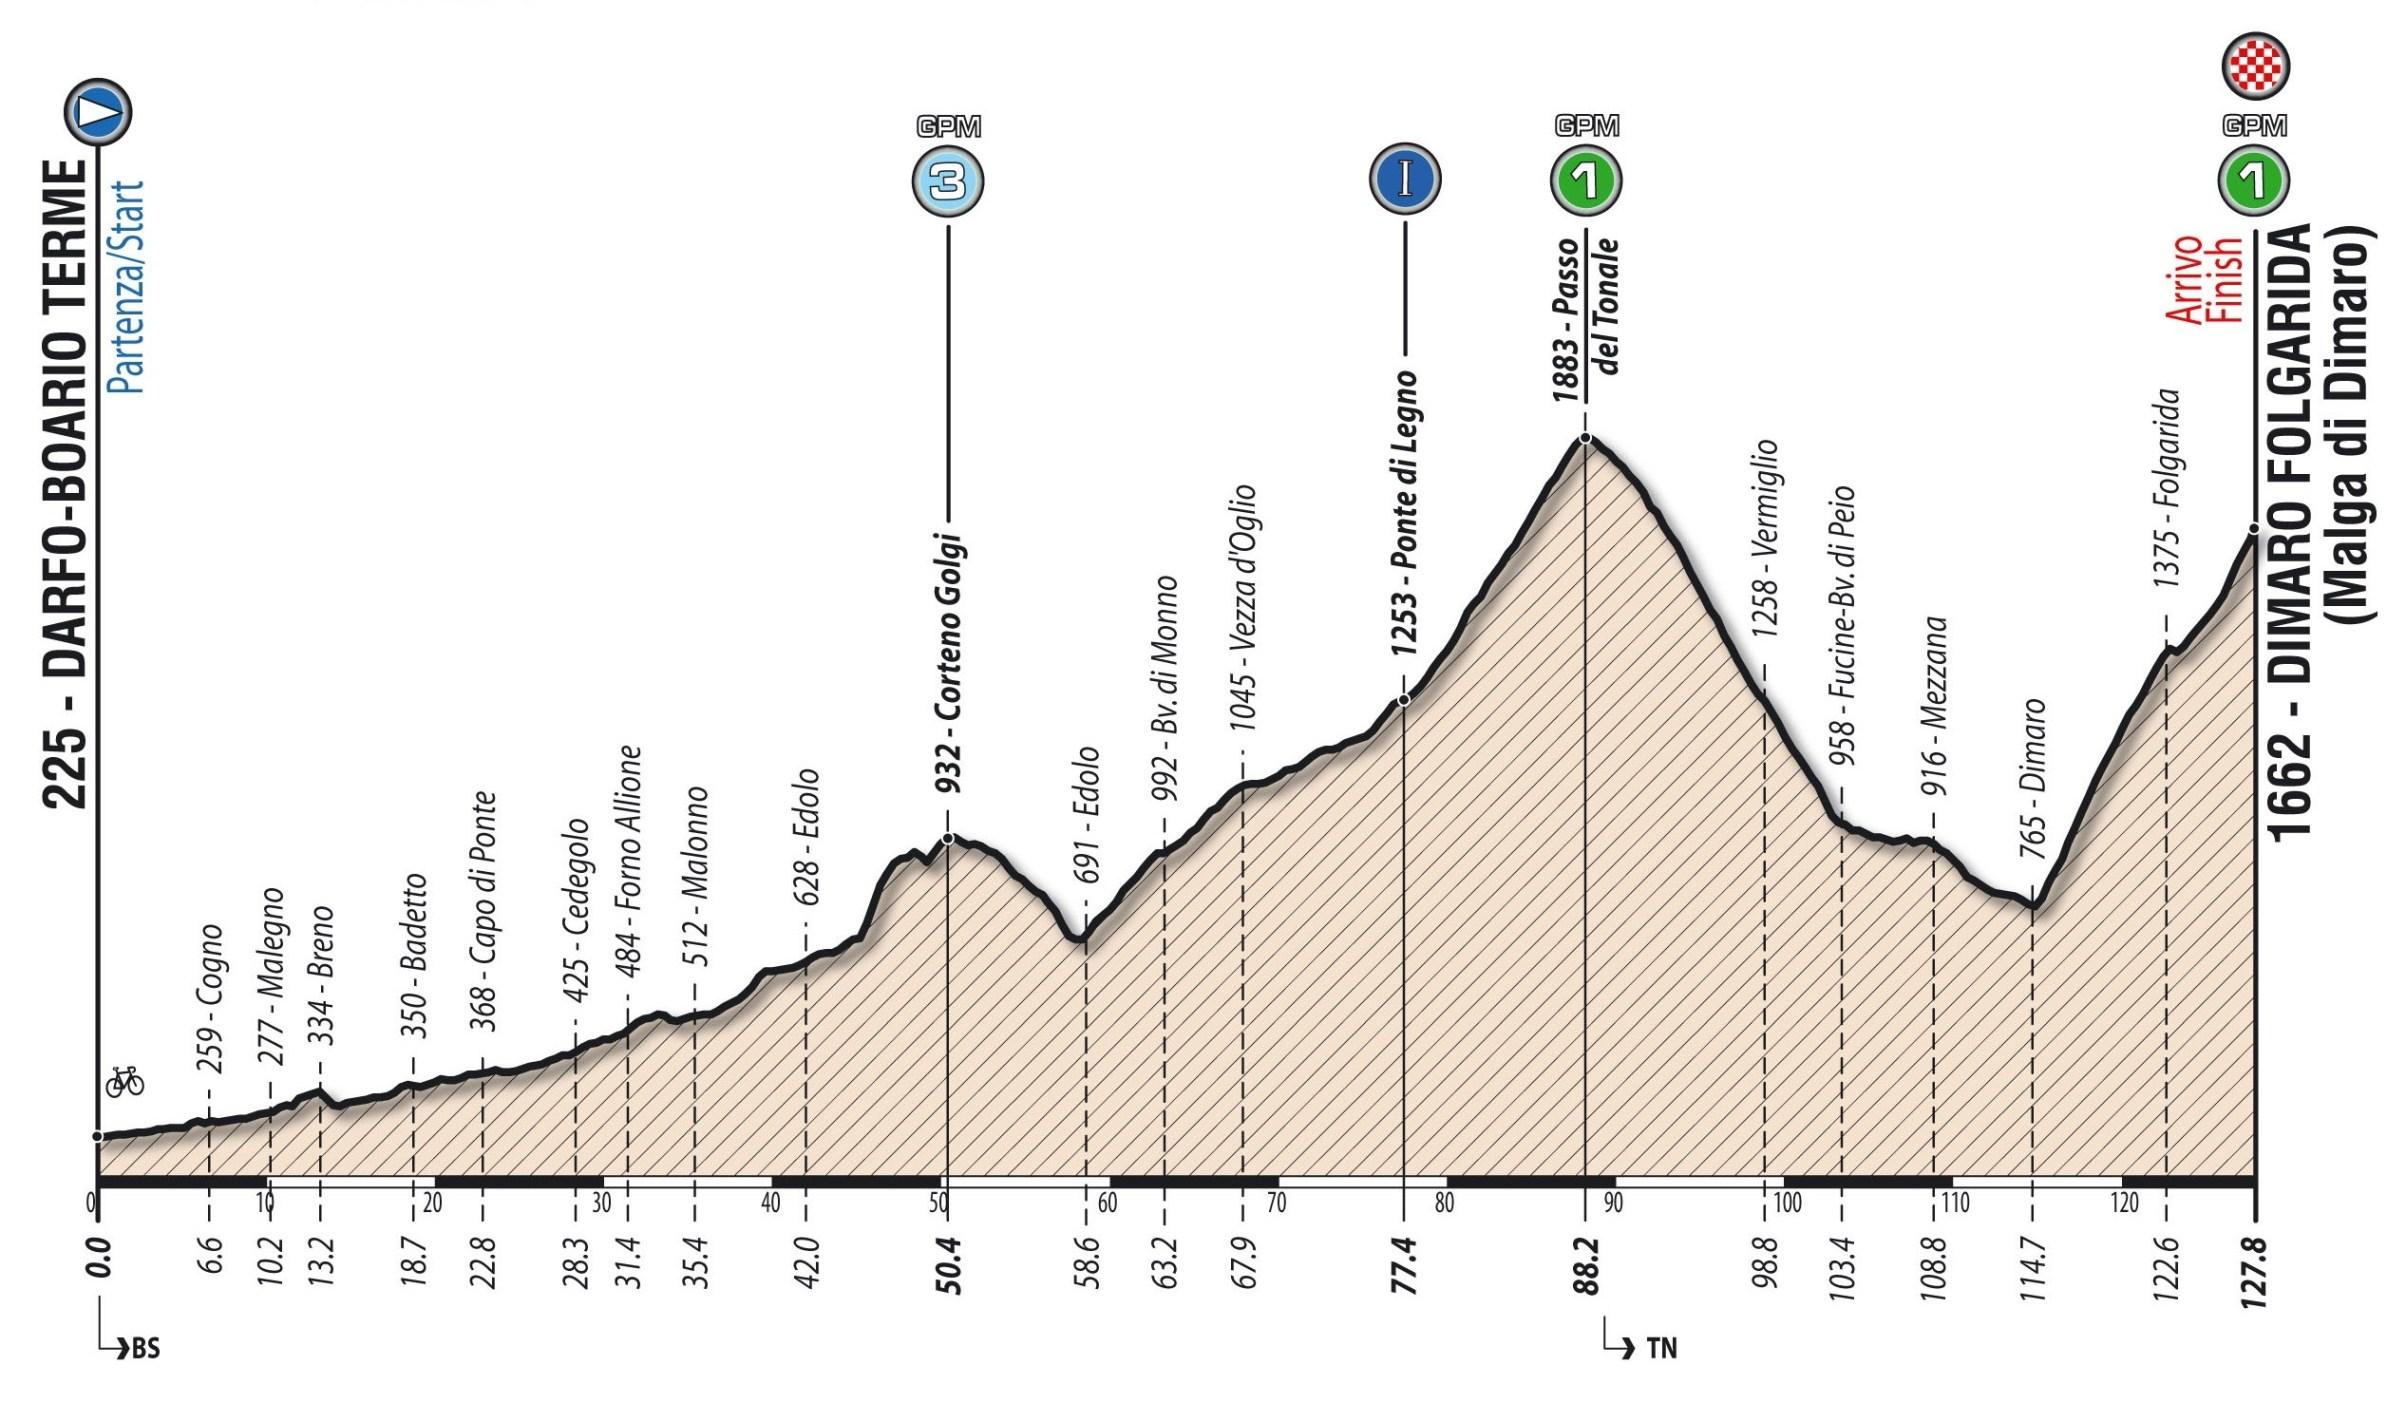 Tappa: 5 - 12 giugno: Darfo Boario Terme - Dimaro Folgarida (Malga di Dimaro), 127.80 km